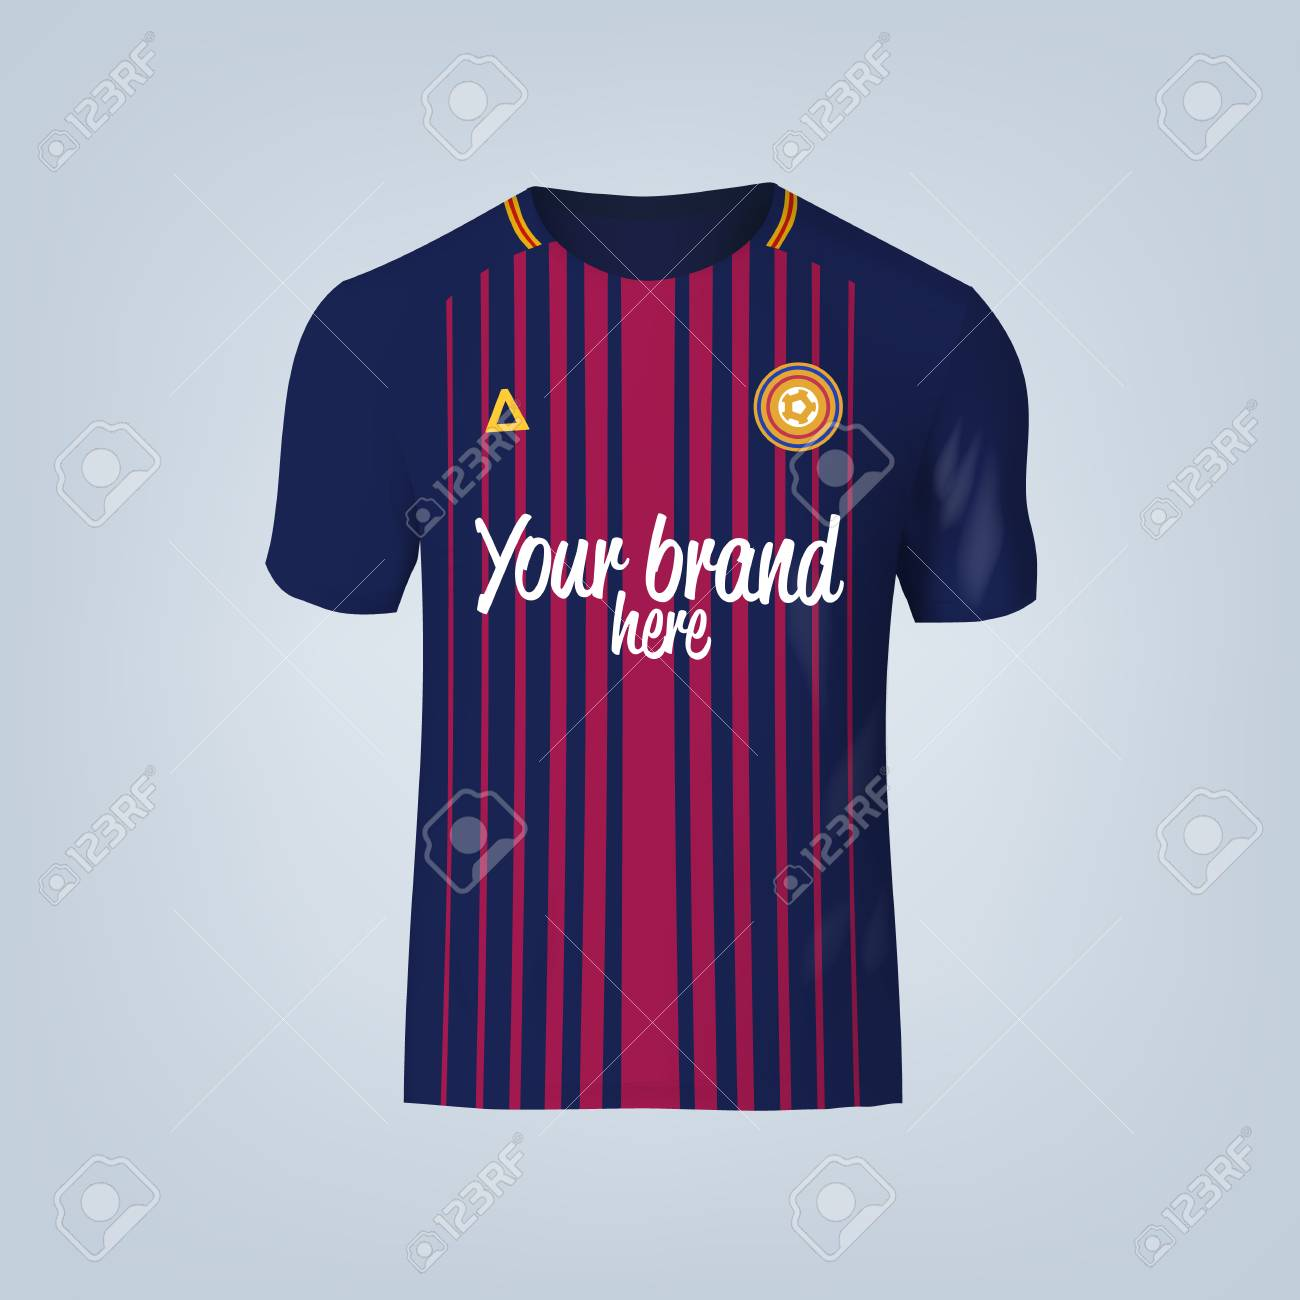 Vector illustration of football t-shirt template. - 84012300